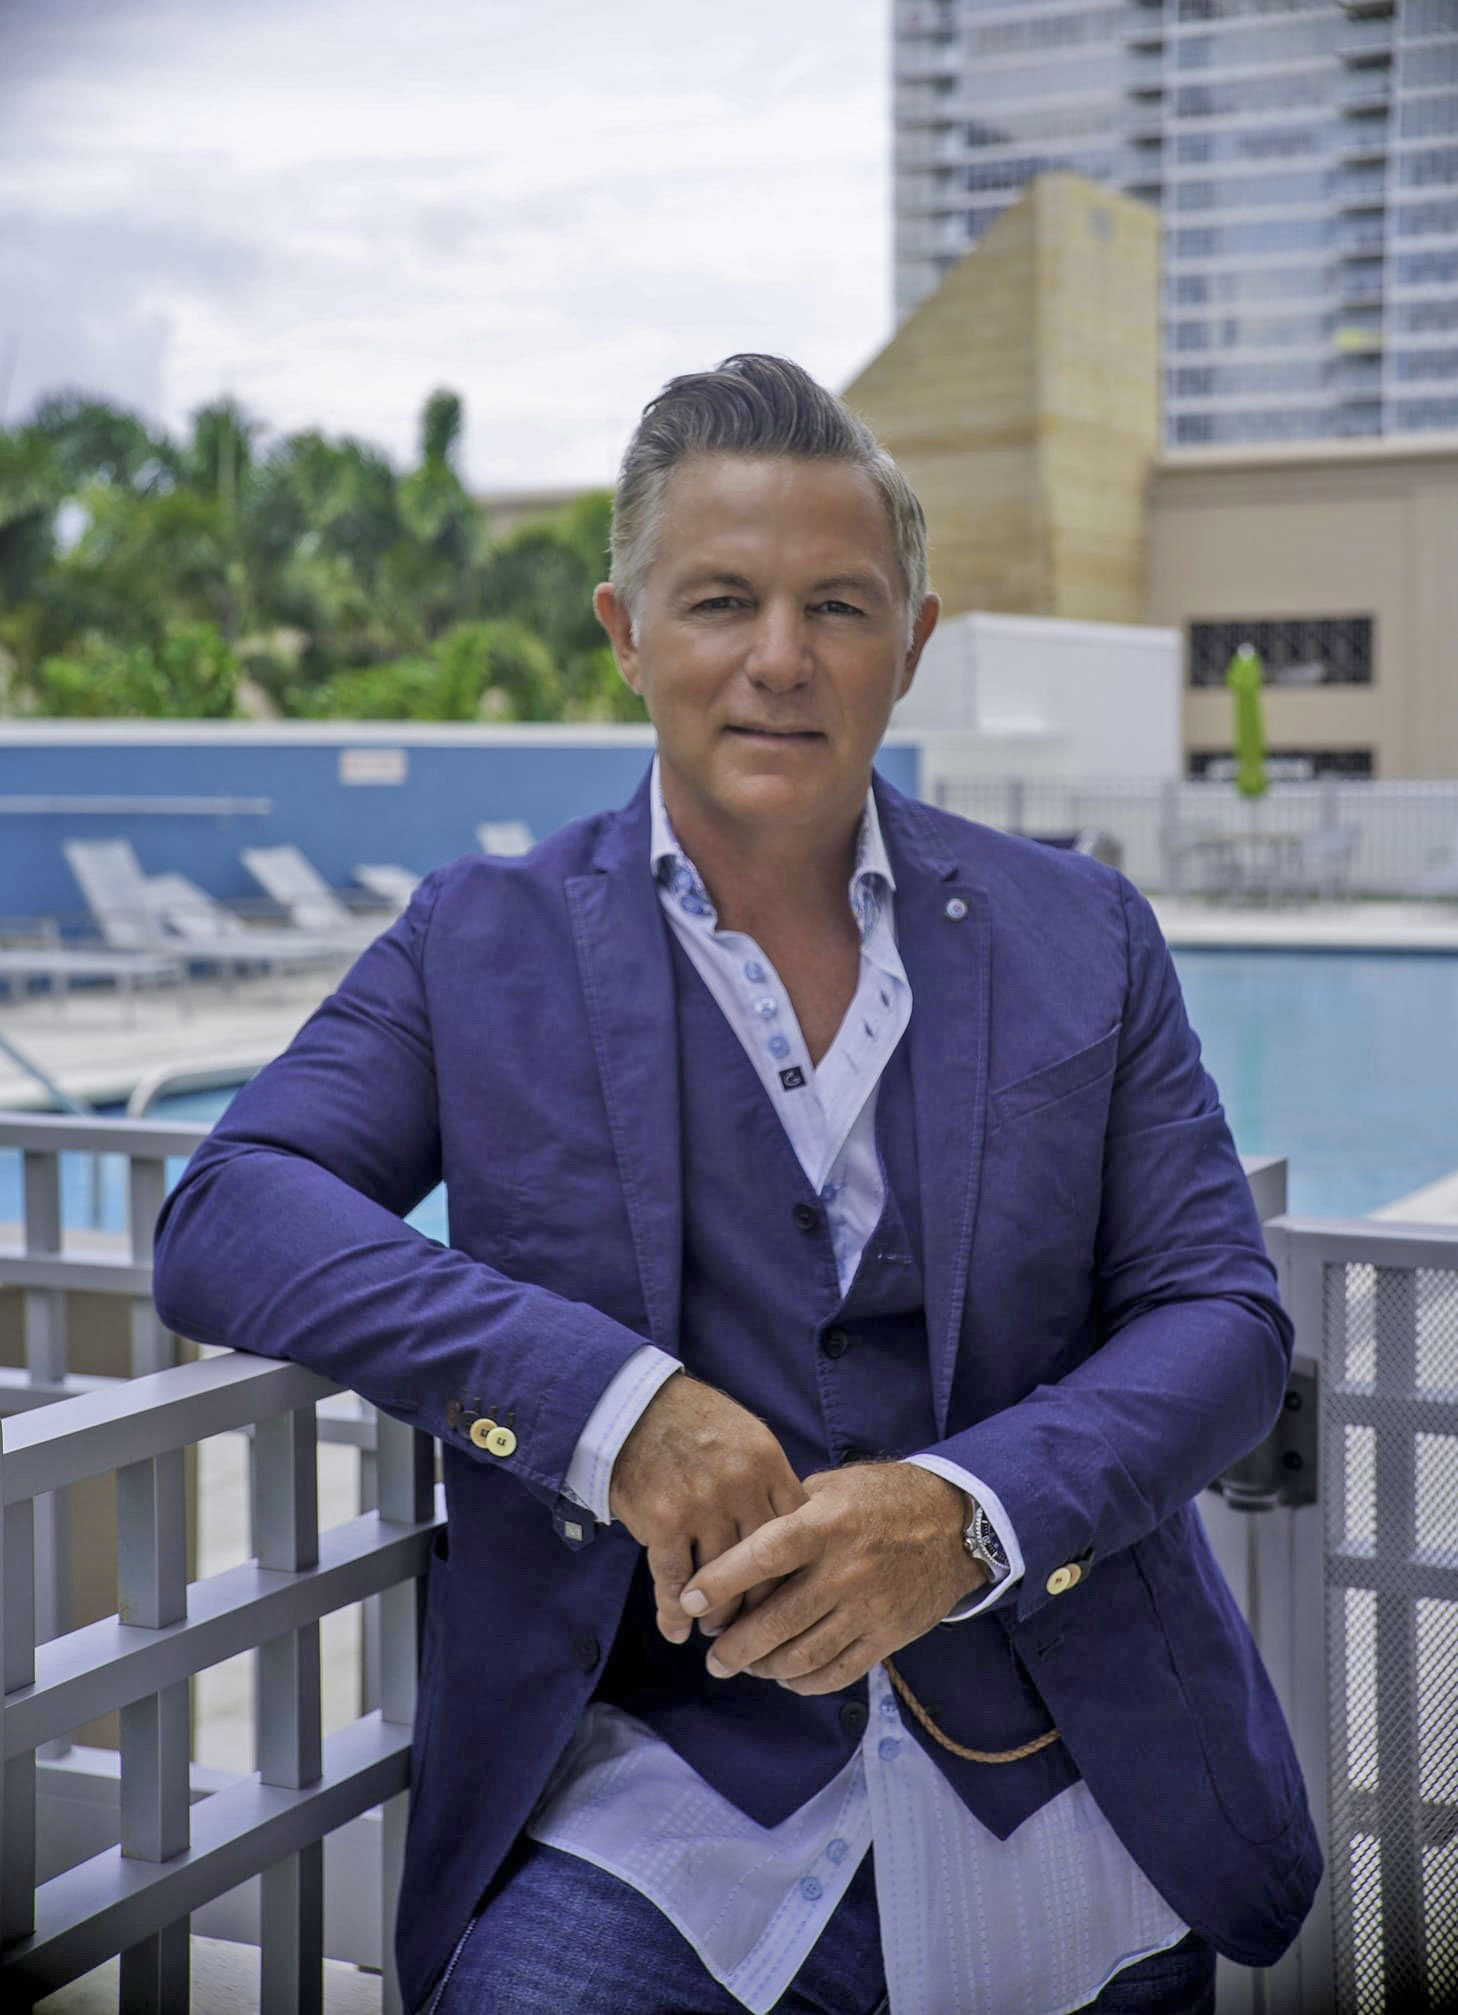 Hans Klenke - Owner of Del Mar Gastro Lounge